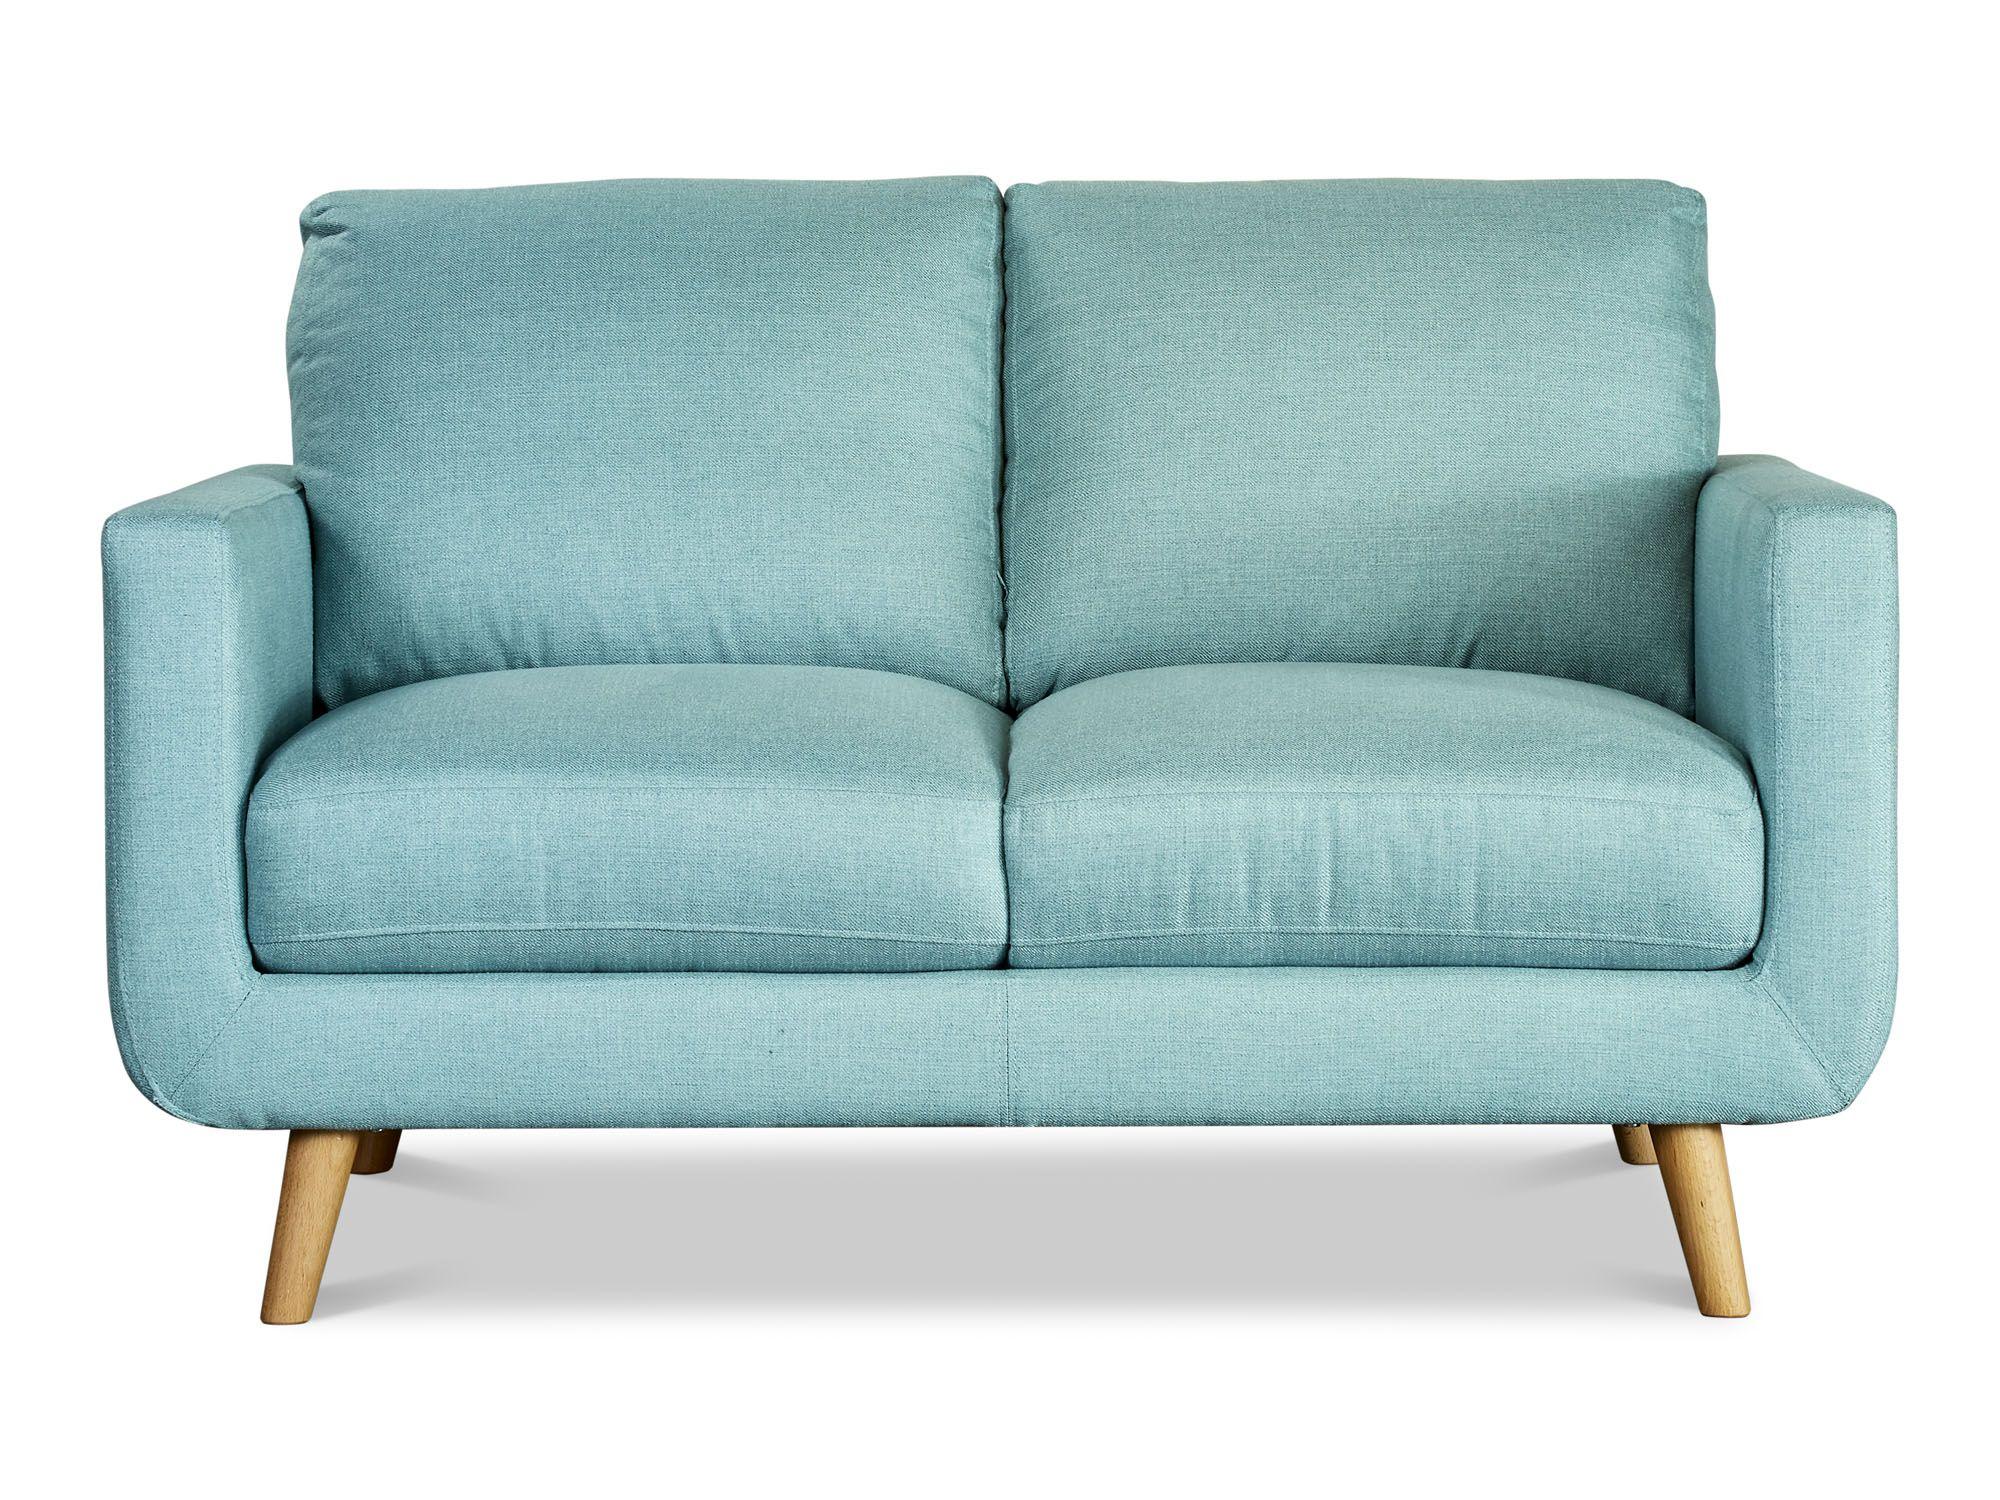 Big Save Sofa Bed Small Round Uk Vinnie Furniture Playroom Pinterest